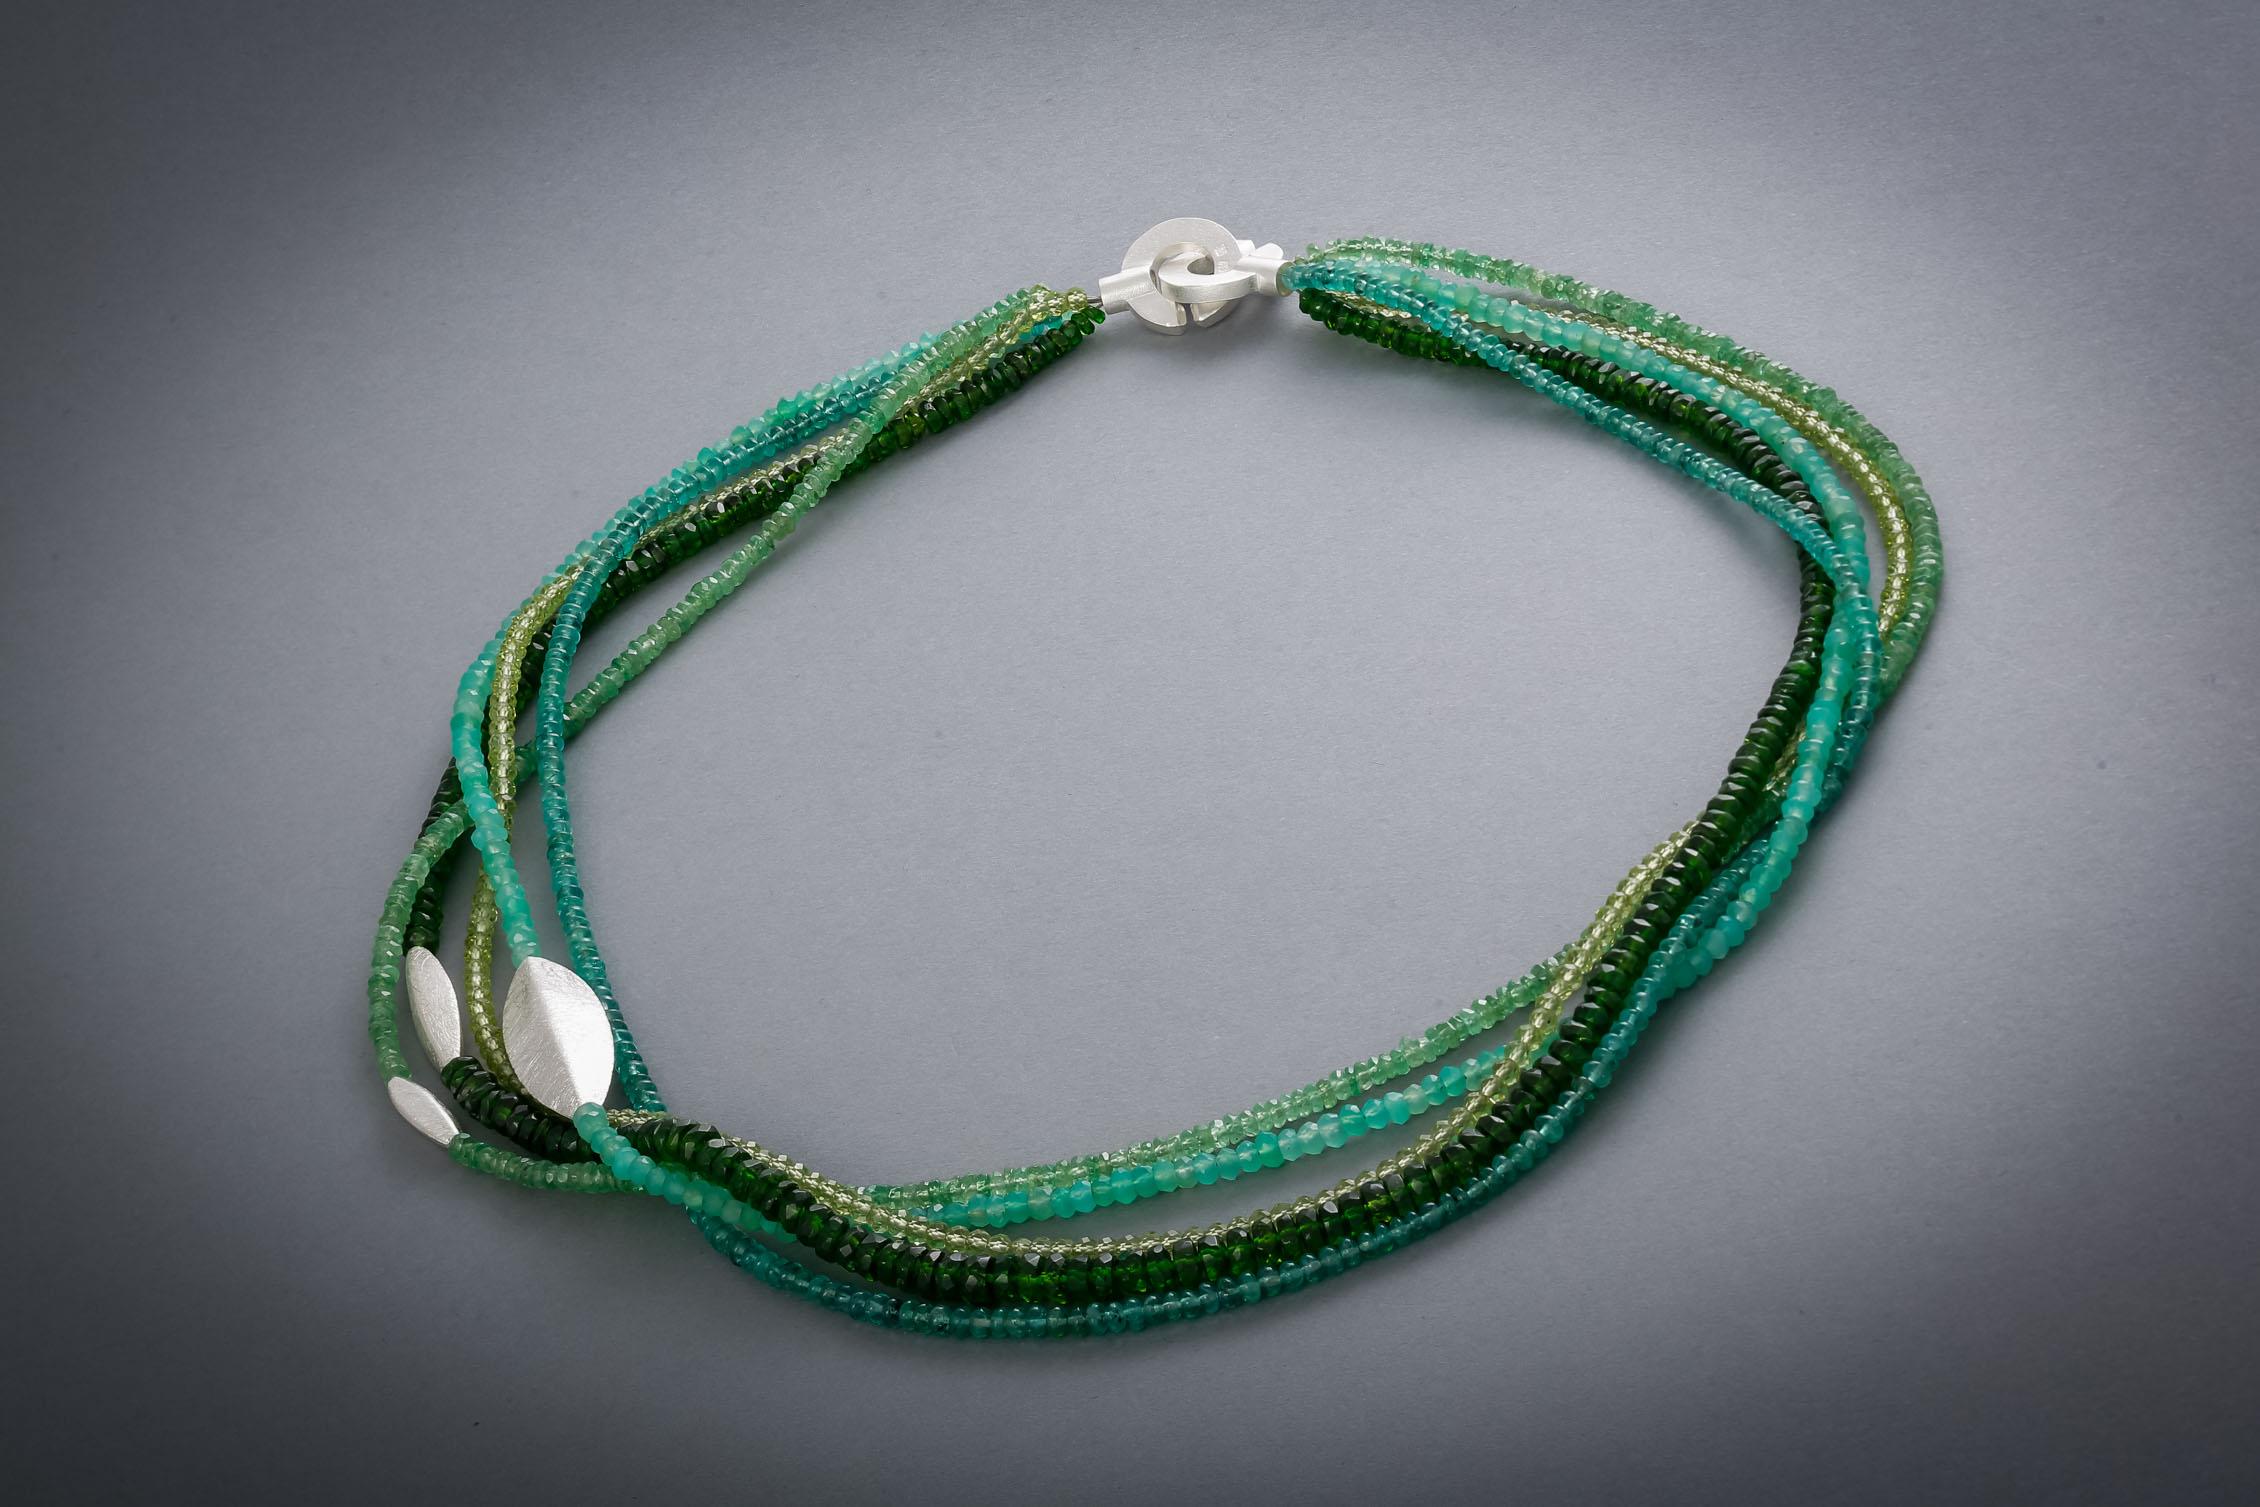 085 Edelsteinkette, Silber, Peridot, Diopsid, Chrysopras, Smaragd, grüner Granat € 412,-